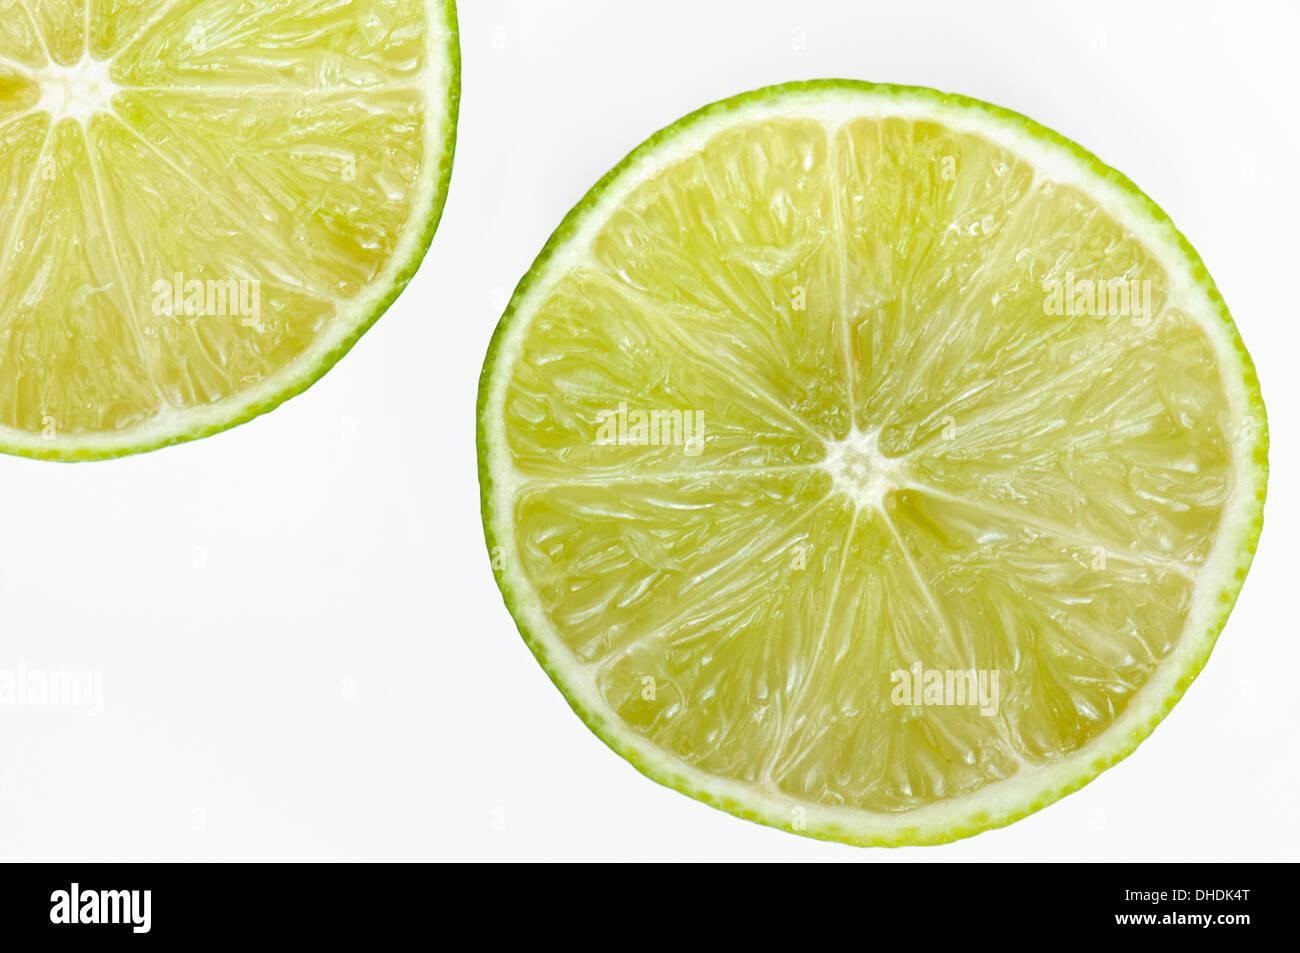 Halved lime segments on white background - Stock Image